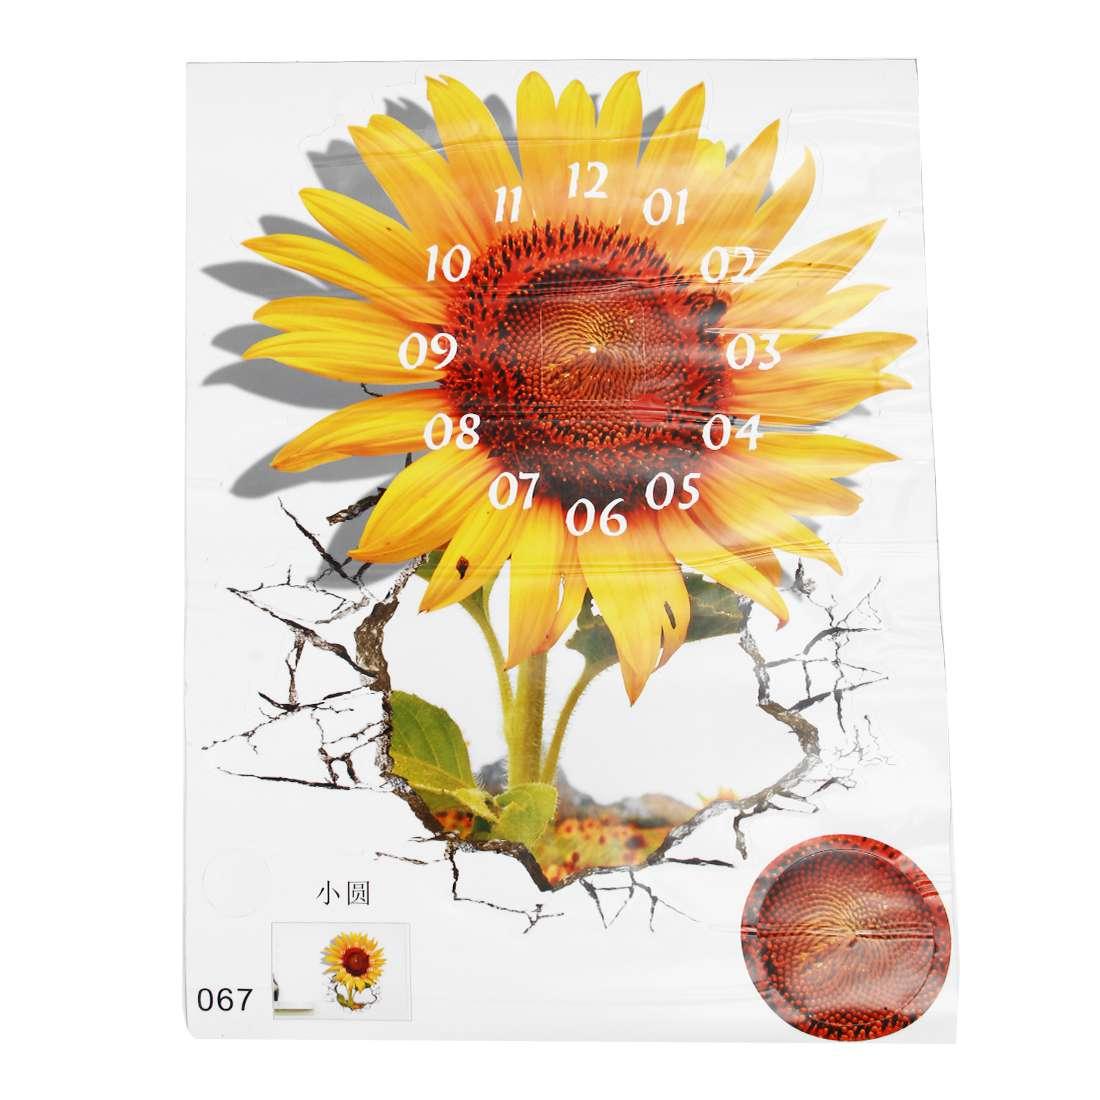 DIY 3D Art Wall Sticker Sunflower Clock Sticker Office Home Wall Decor Gift 18x15 stylish sunflower pattern removable 3d wall sticker for home decor